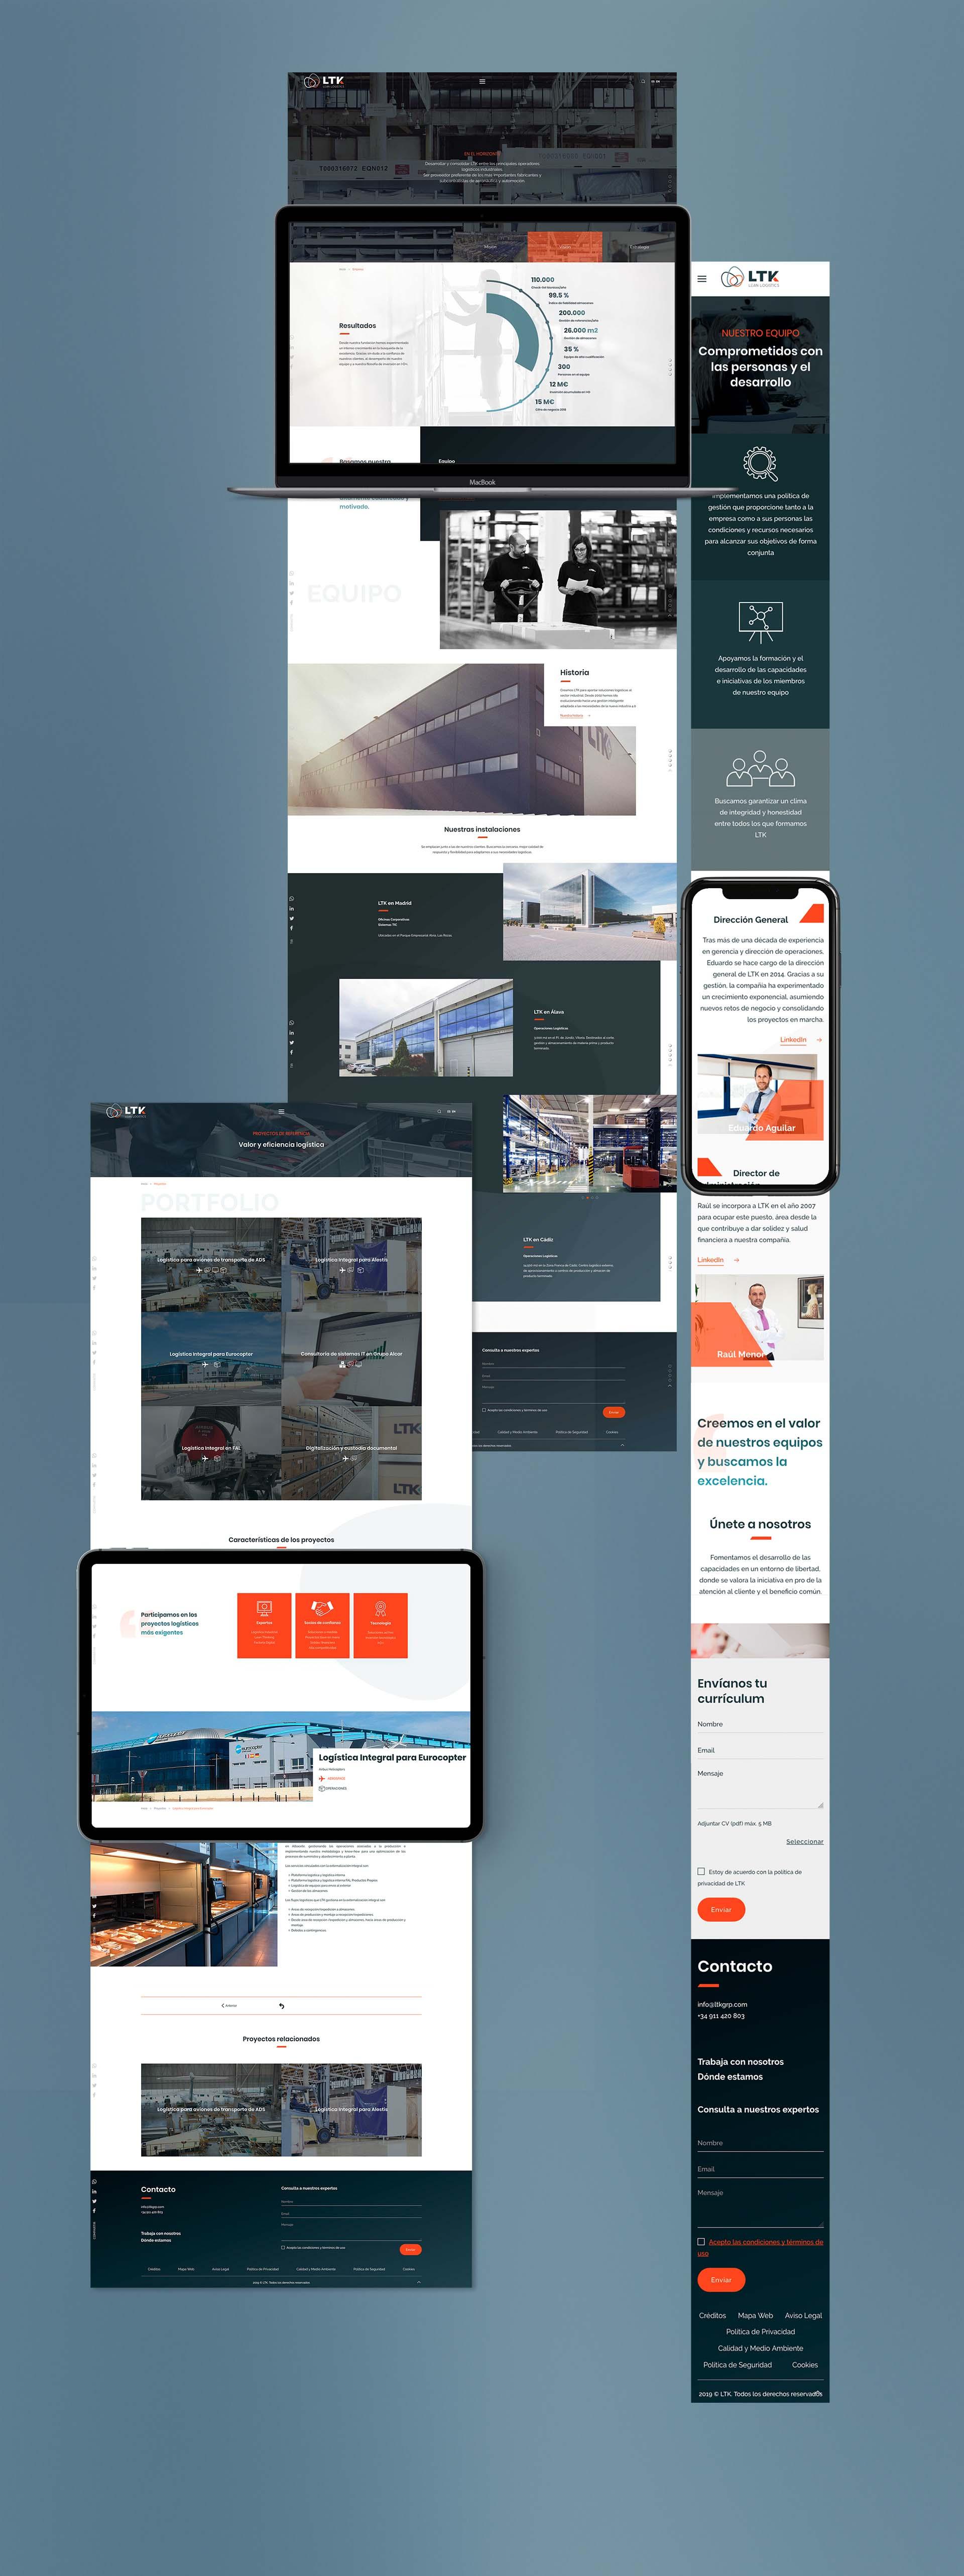 Web design for the logistics company LTK